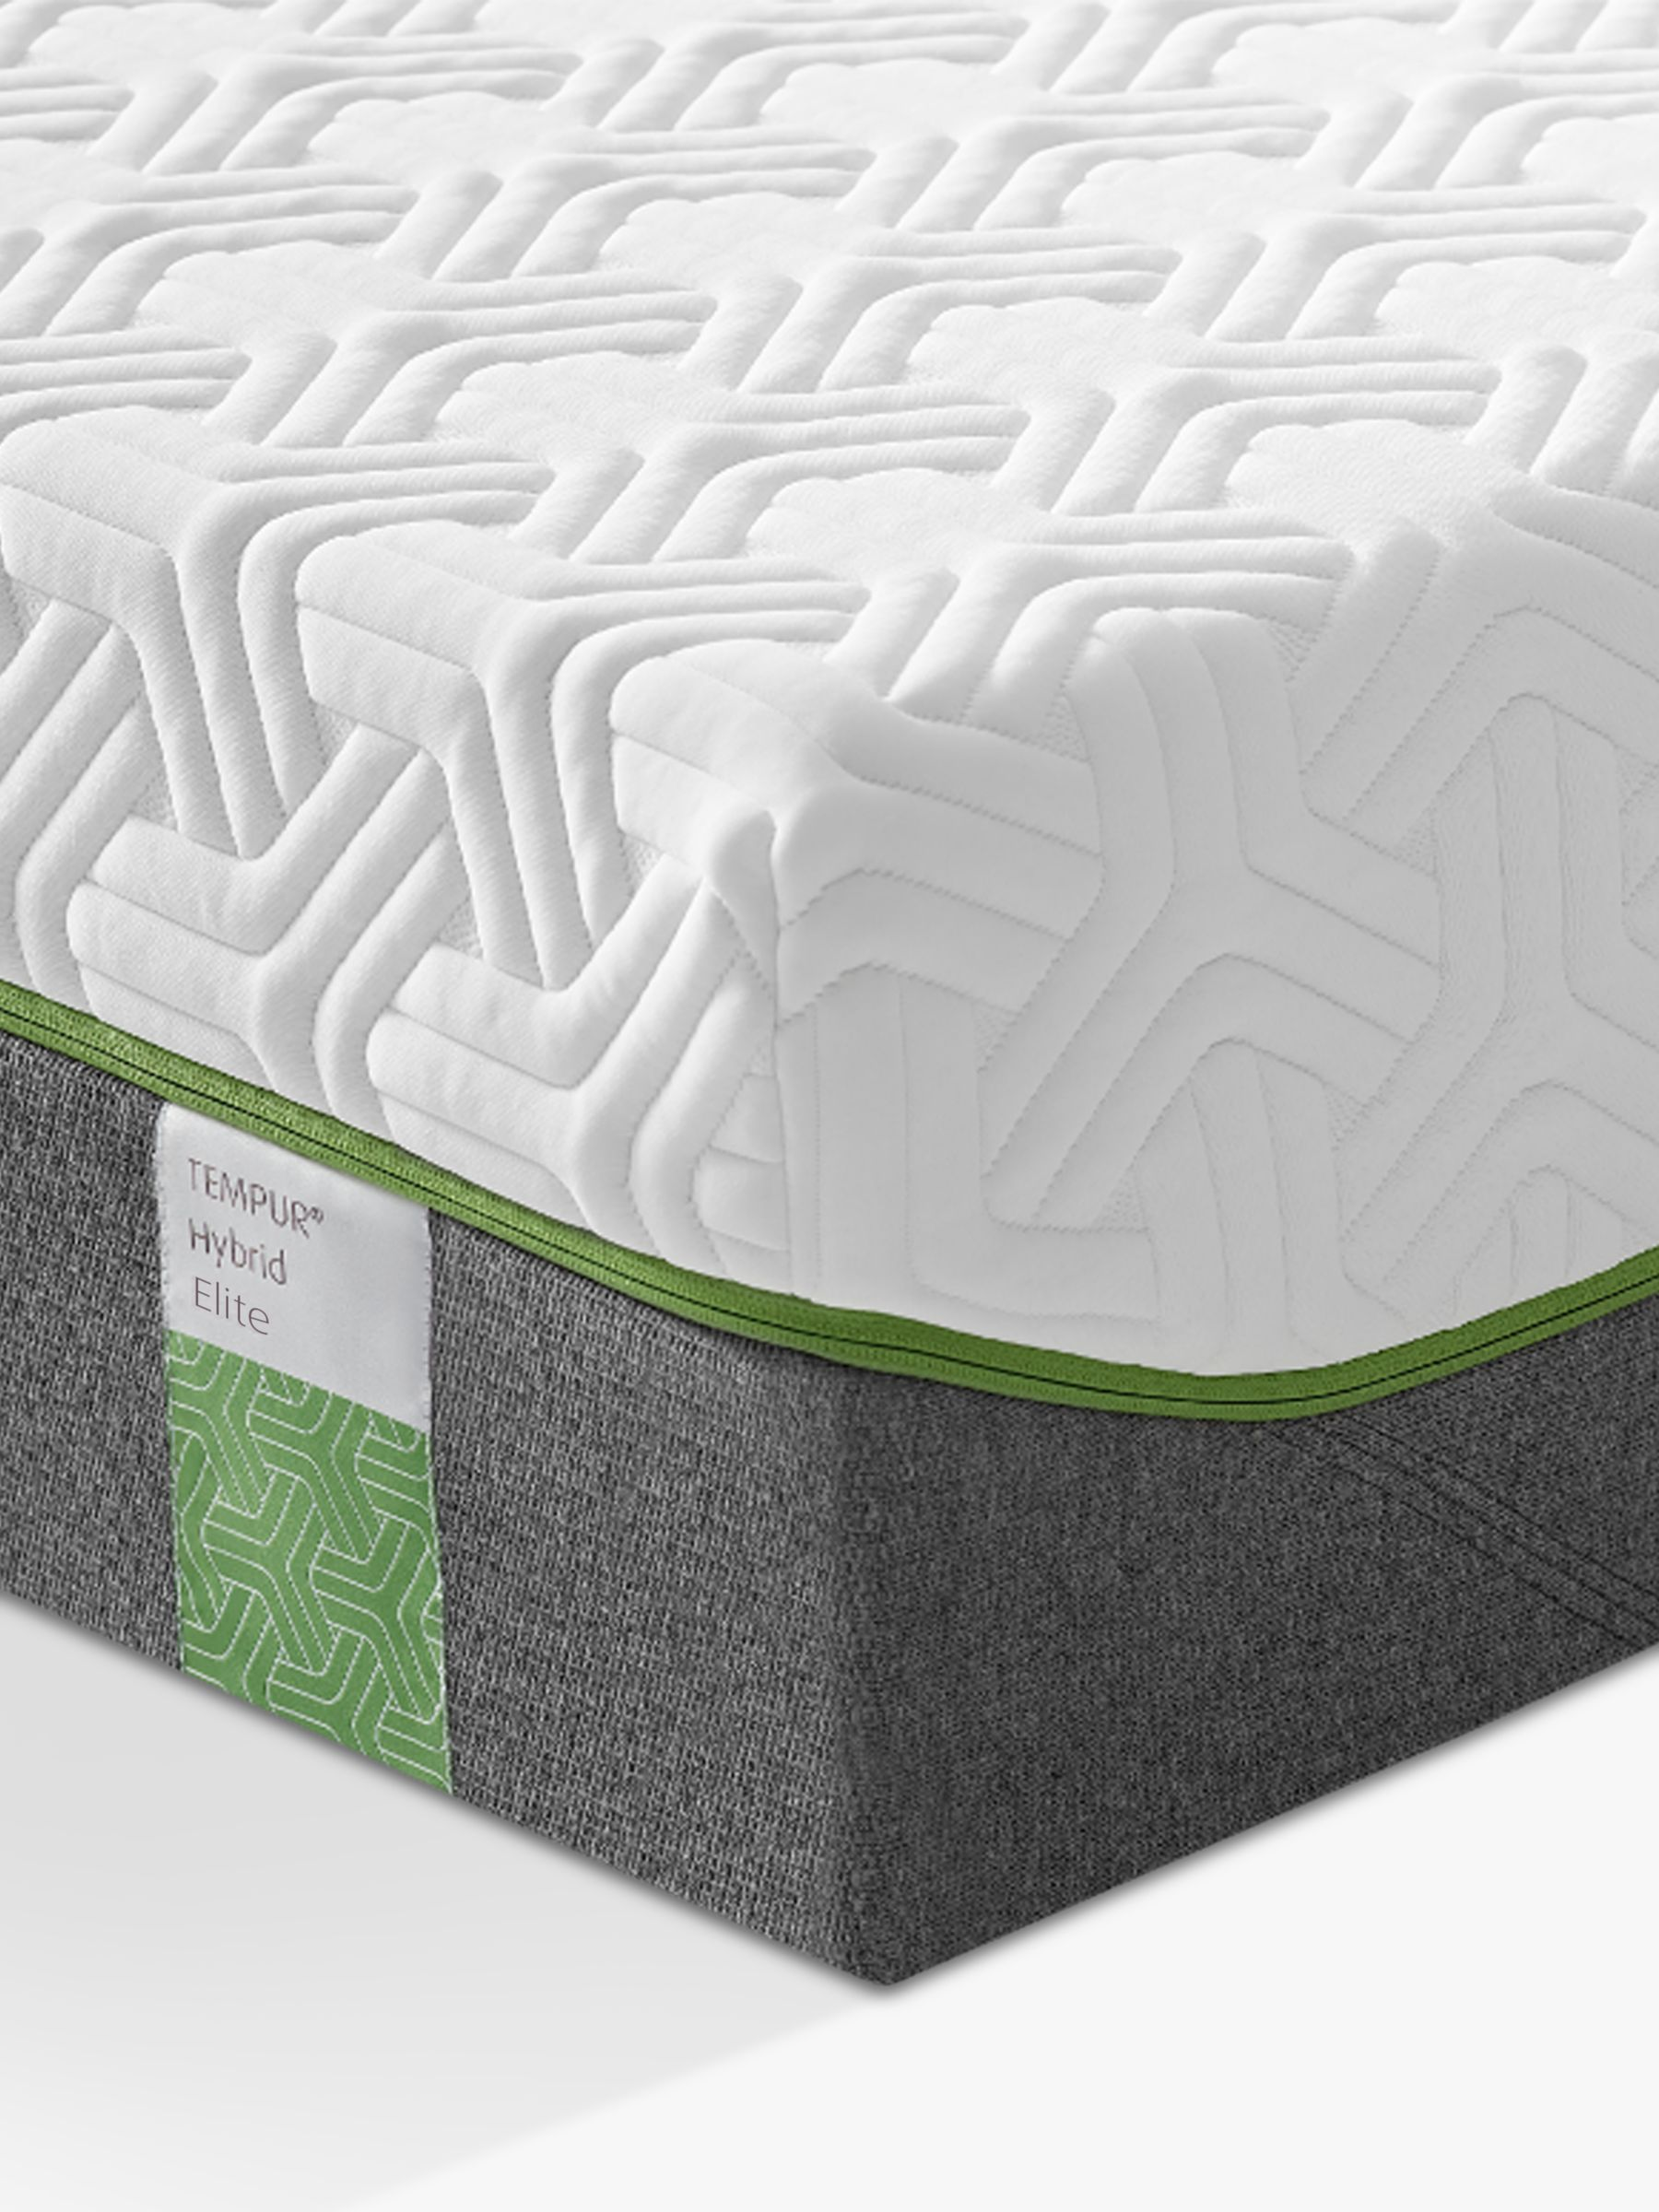 Tempur Tempur Hybrid Elite 25 Pocket Spring Memory Foam Mattress, Medium Tension, Extra Long Single